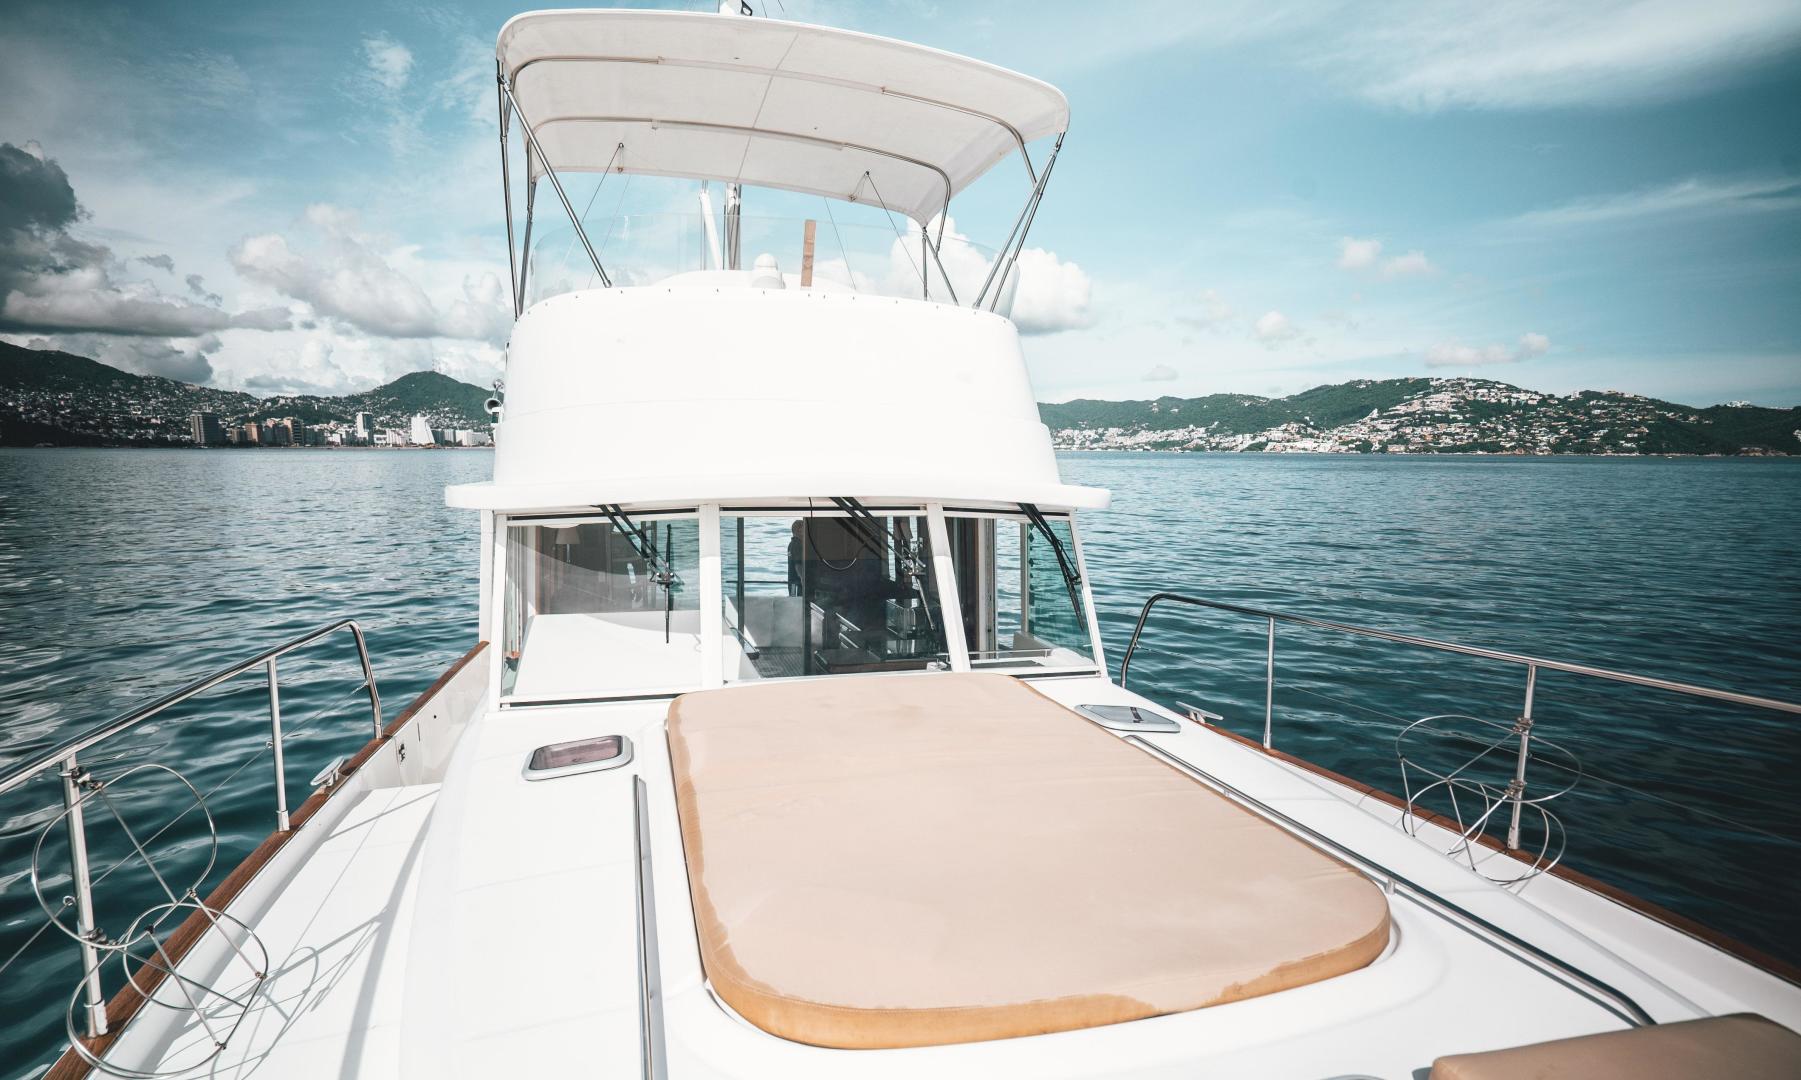 Beneteau-Swift Trawler 2008-Amadeus Acapulco-Mexico-1487054 | Thumbnail